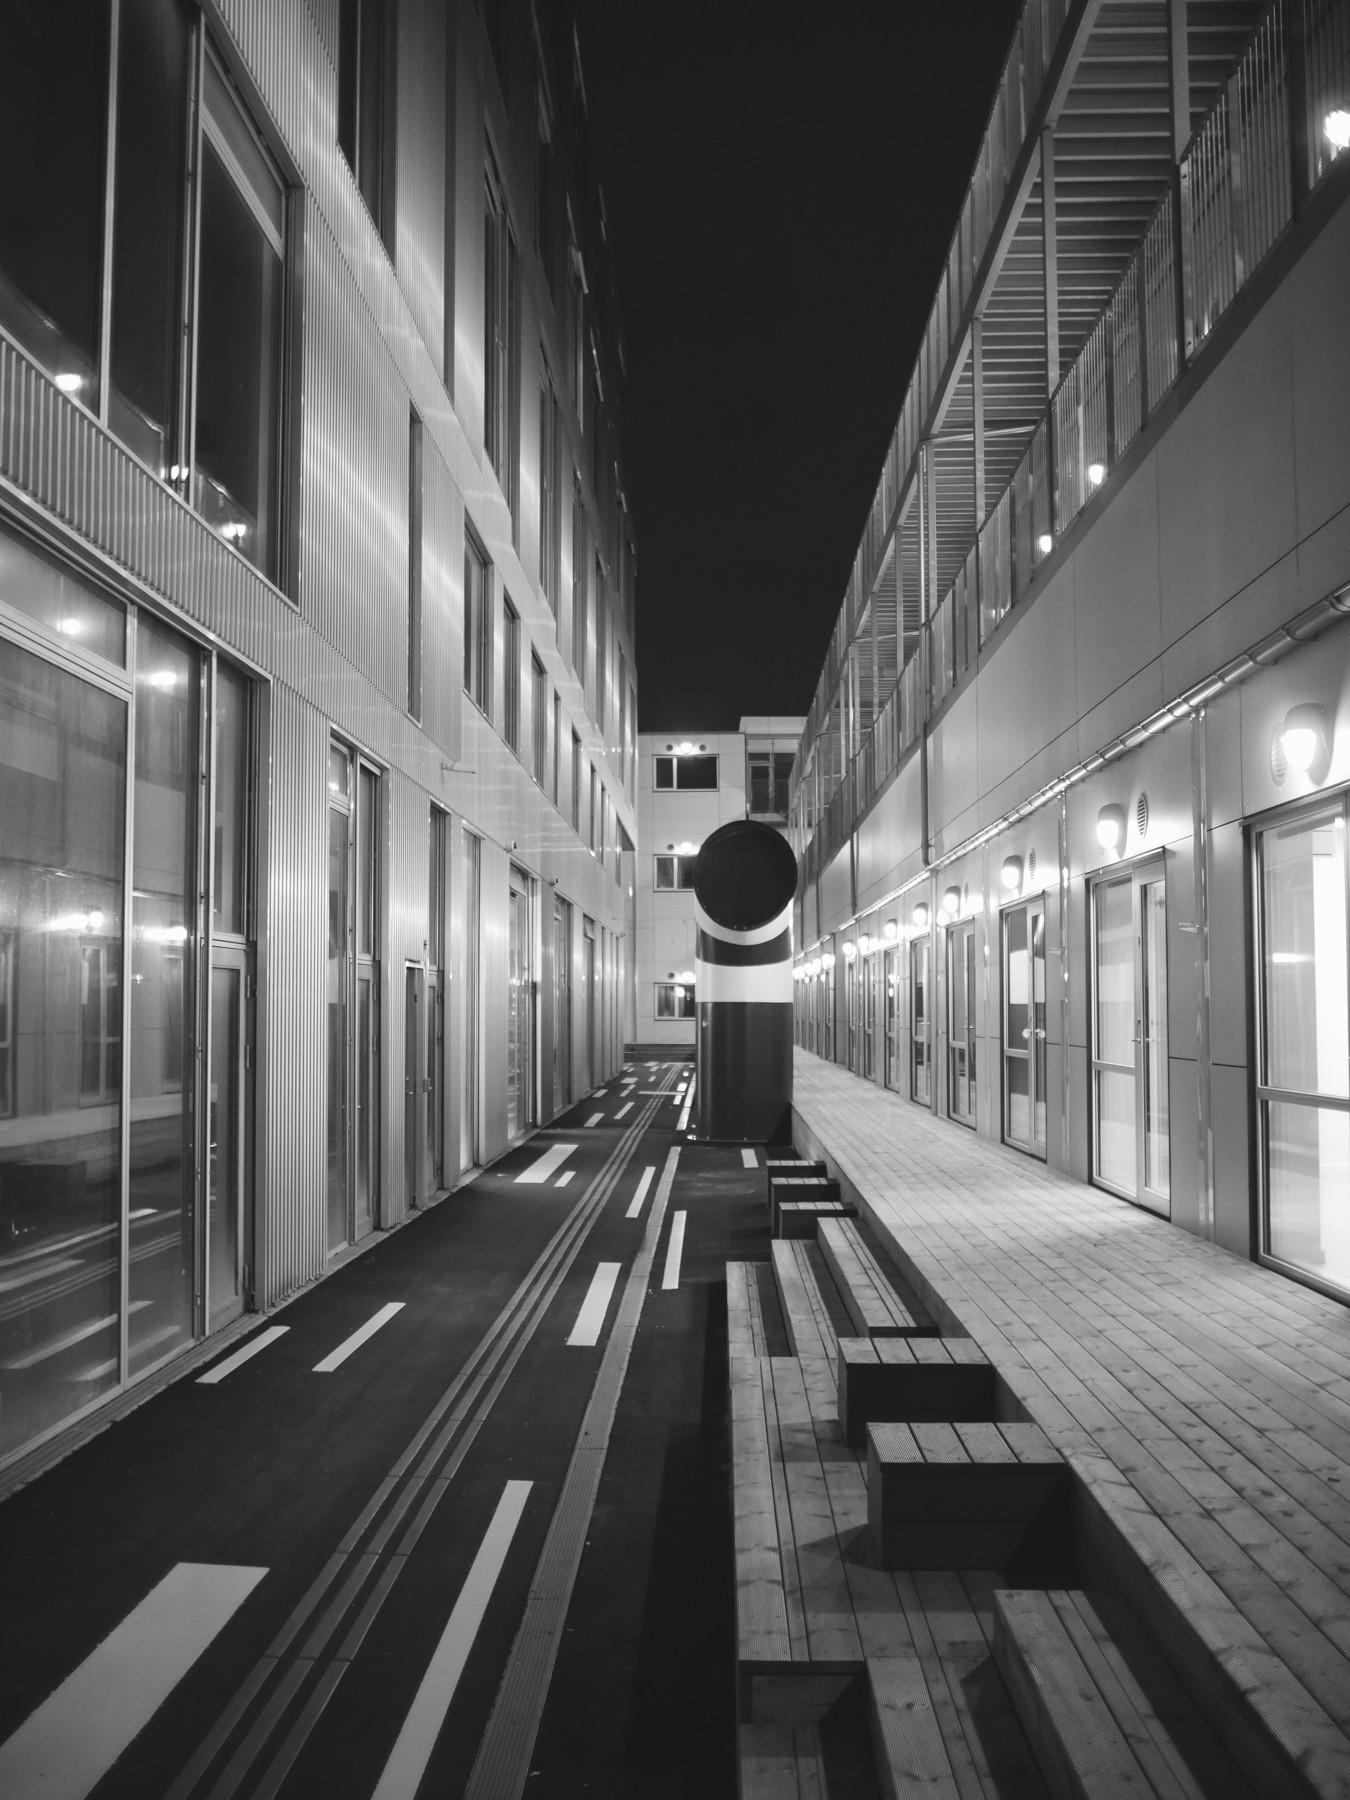 Urban geometry: Sydhavnen i Kbh - Skolen i Sydhavnen - Voigtländer 17.5mm til Micro Four Thirds